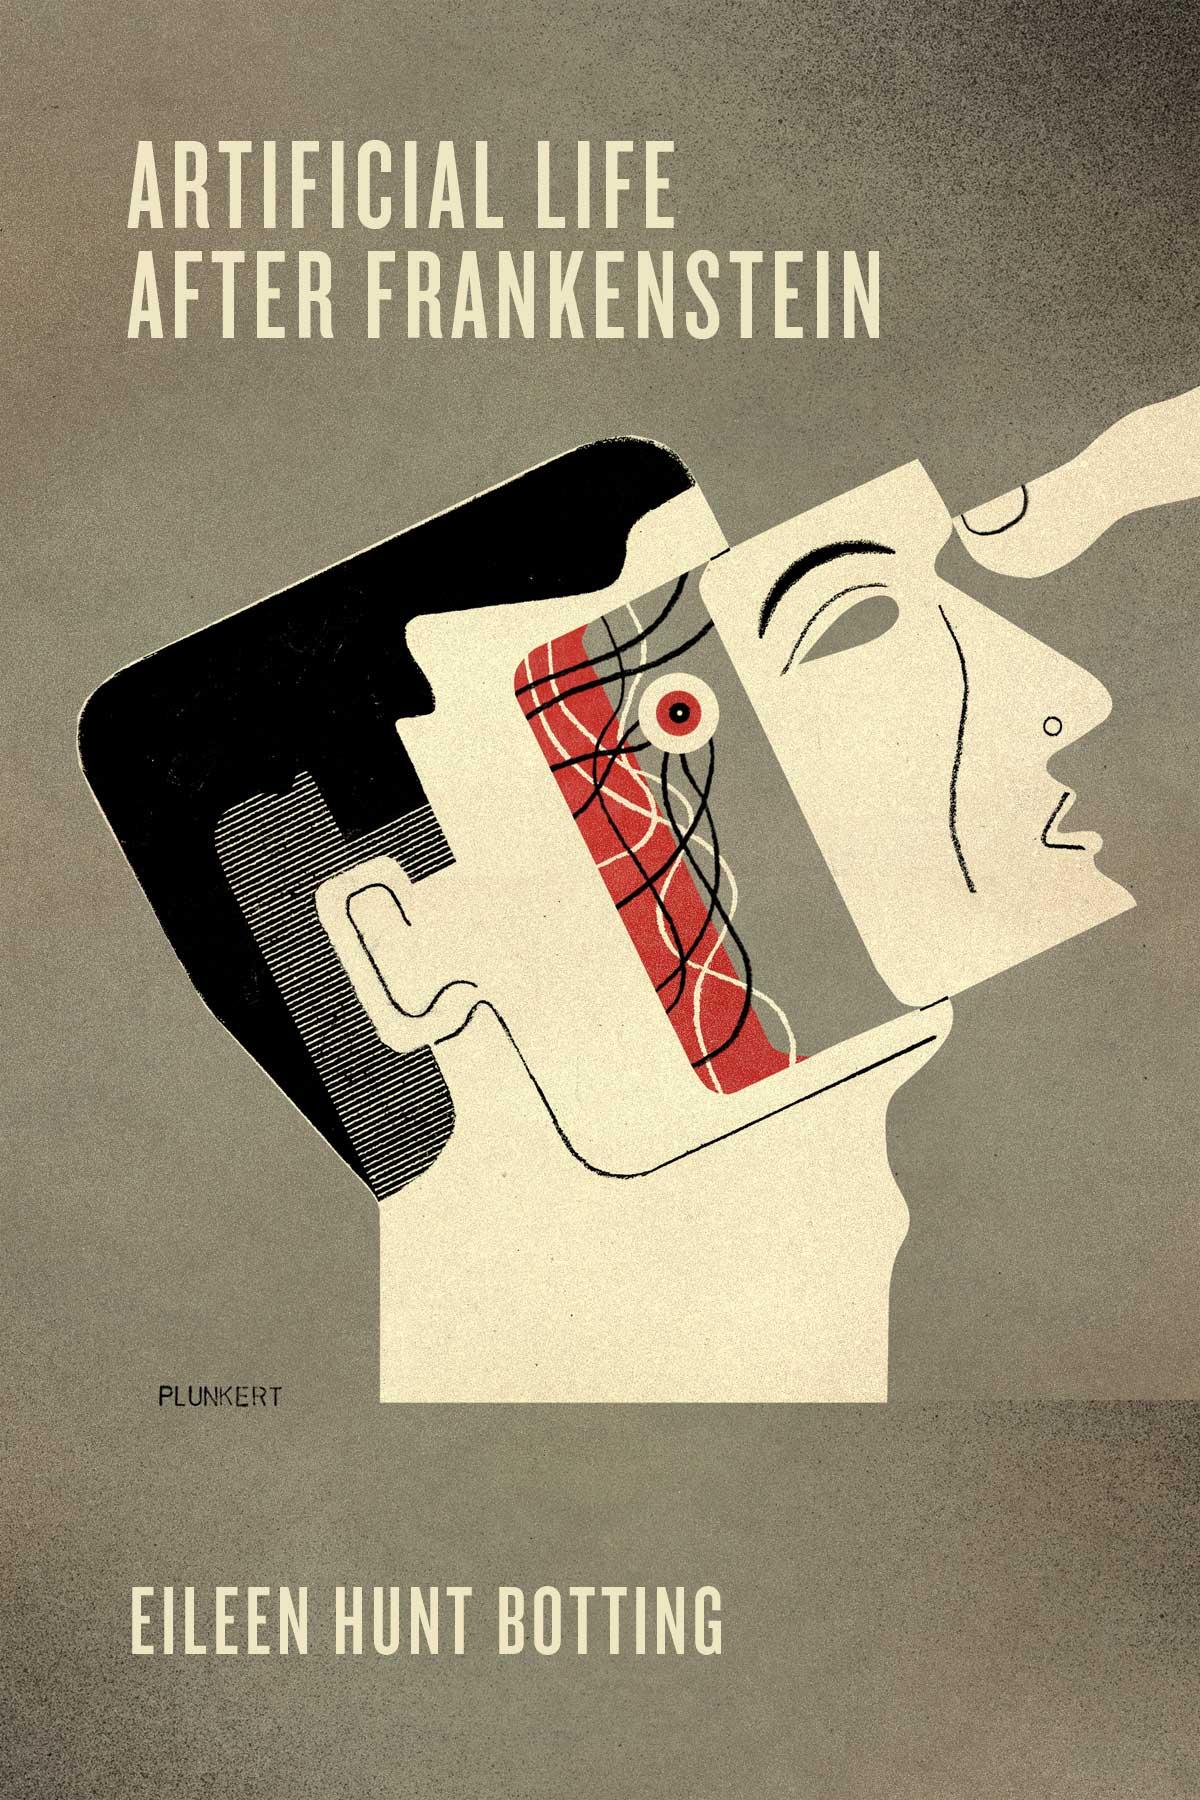 David Plunkert / Artificial Life After Frankenstein / University of Pennsylvania Press